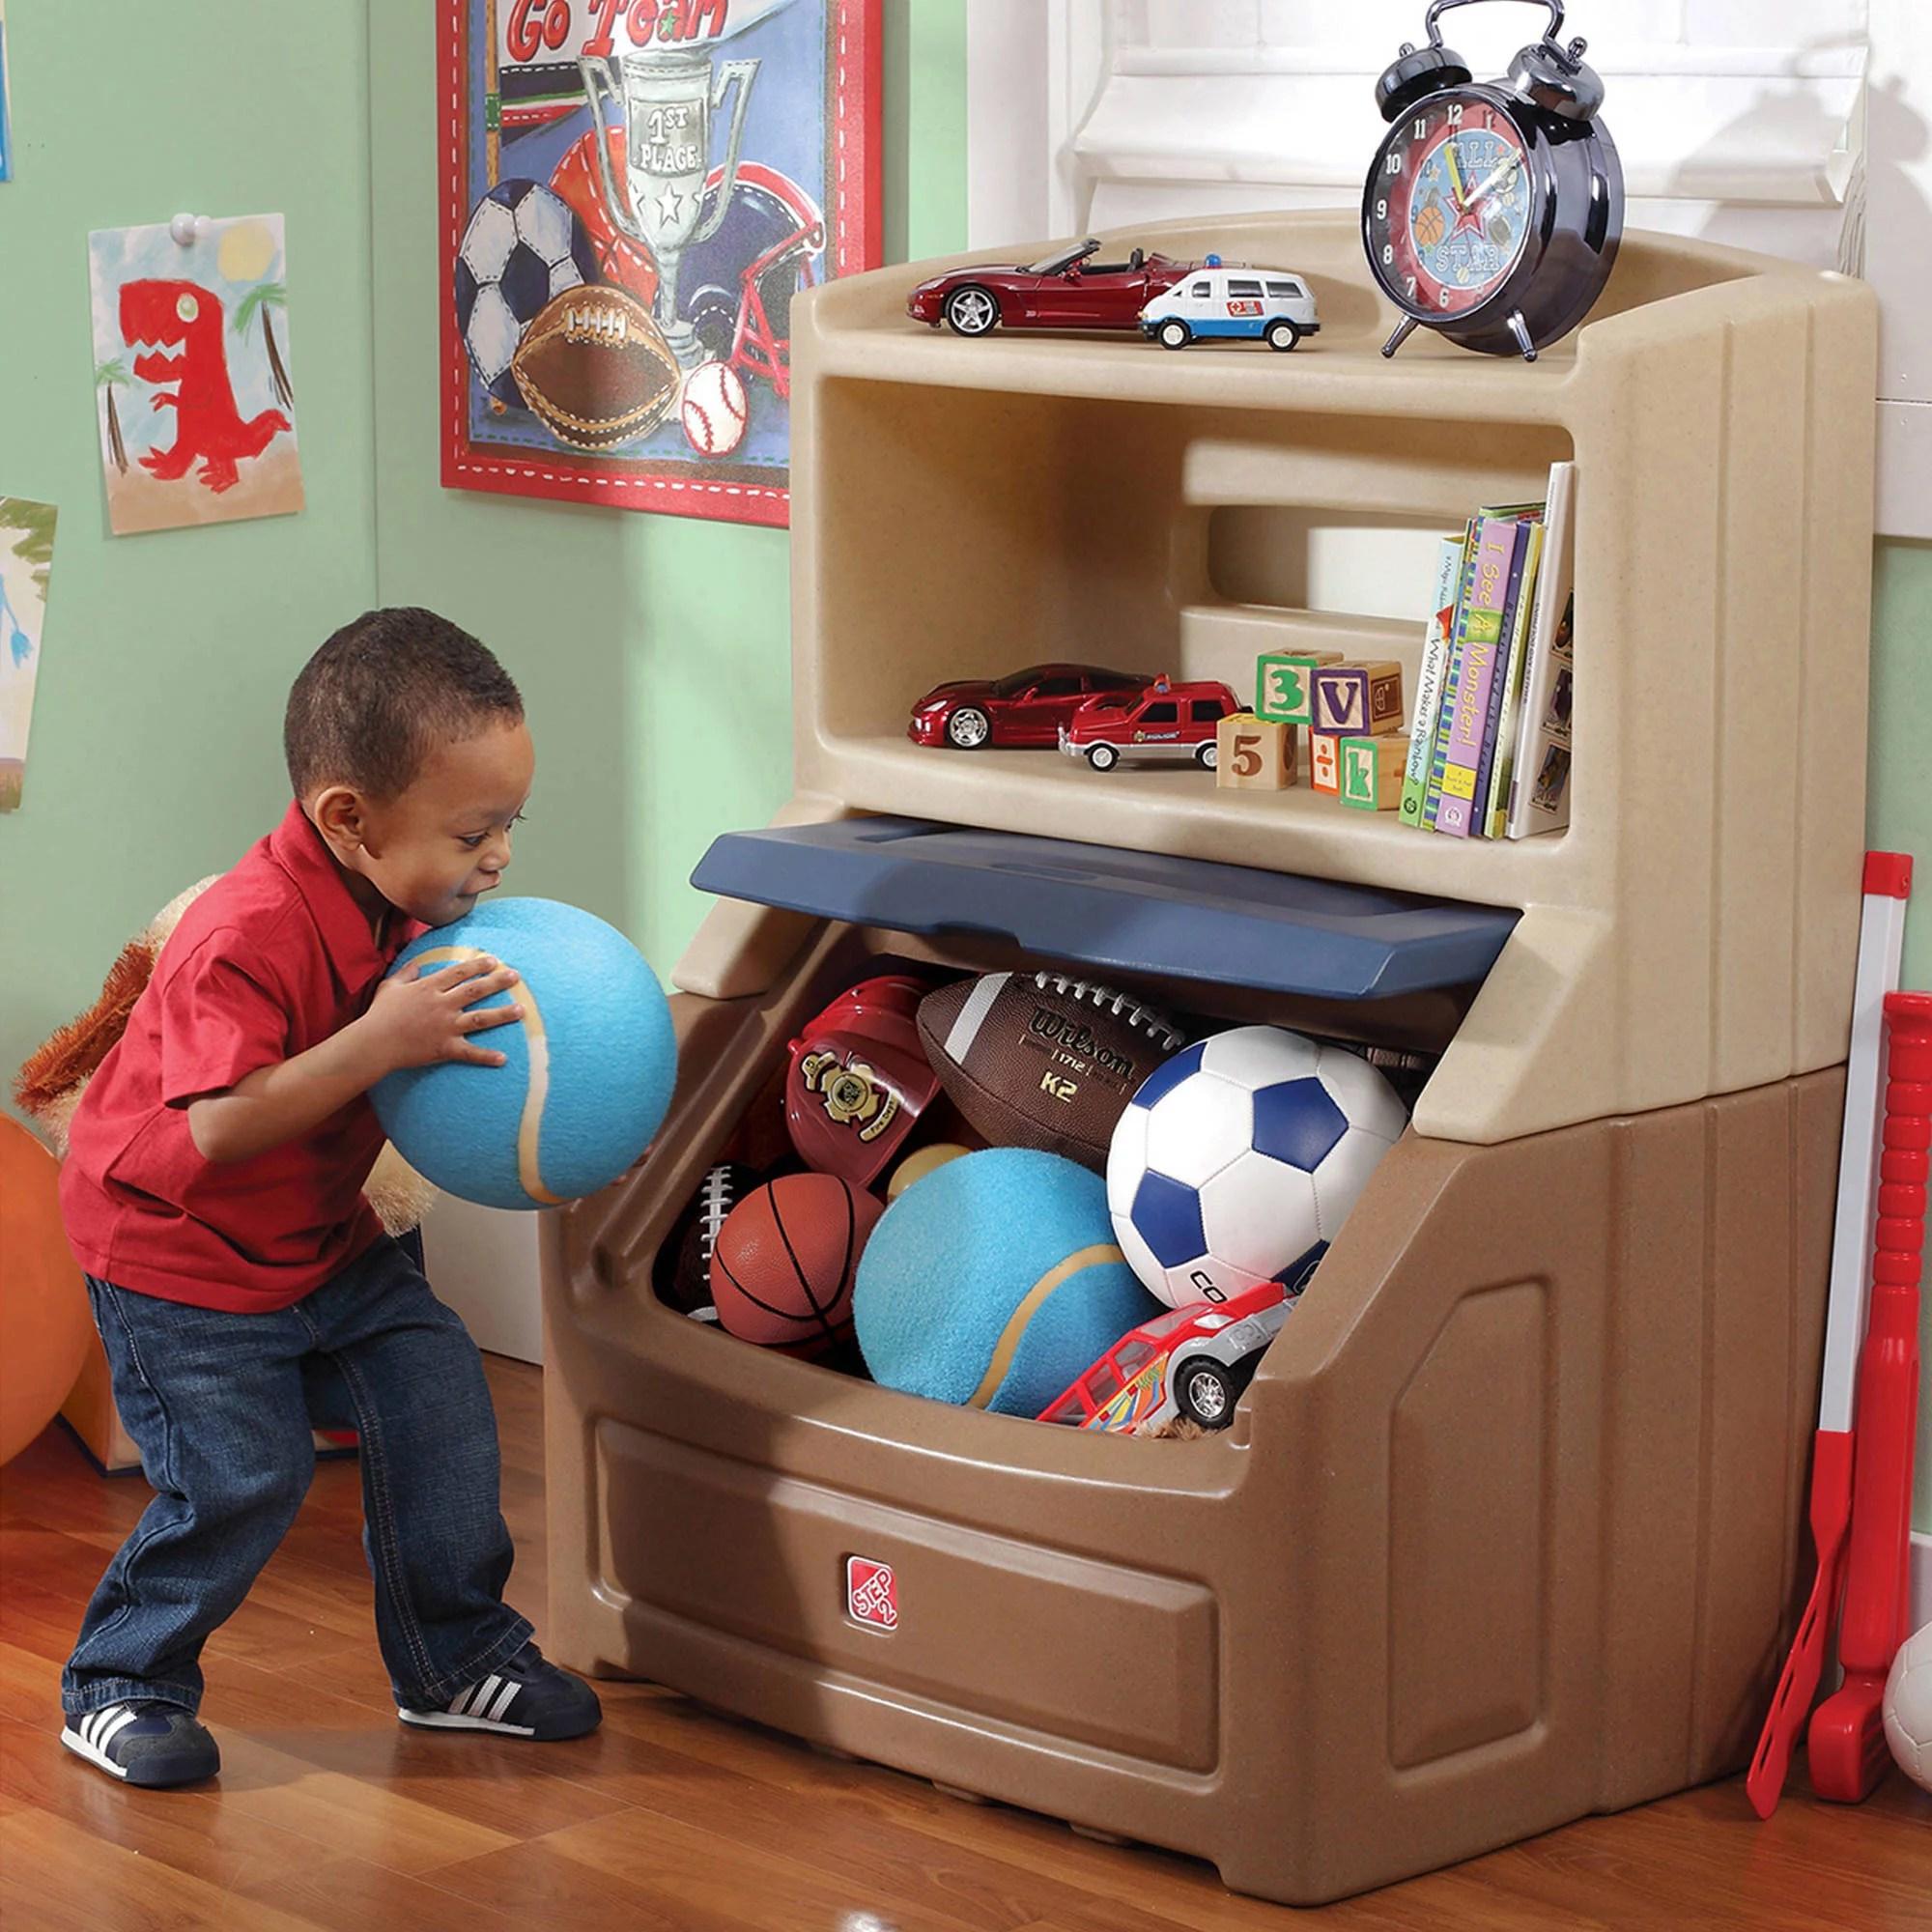 Details About Kids Toy Box Bookcase Storage Chest Bedroom Playroom Organizer Bin Trunk Bench